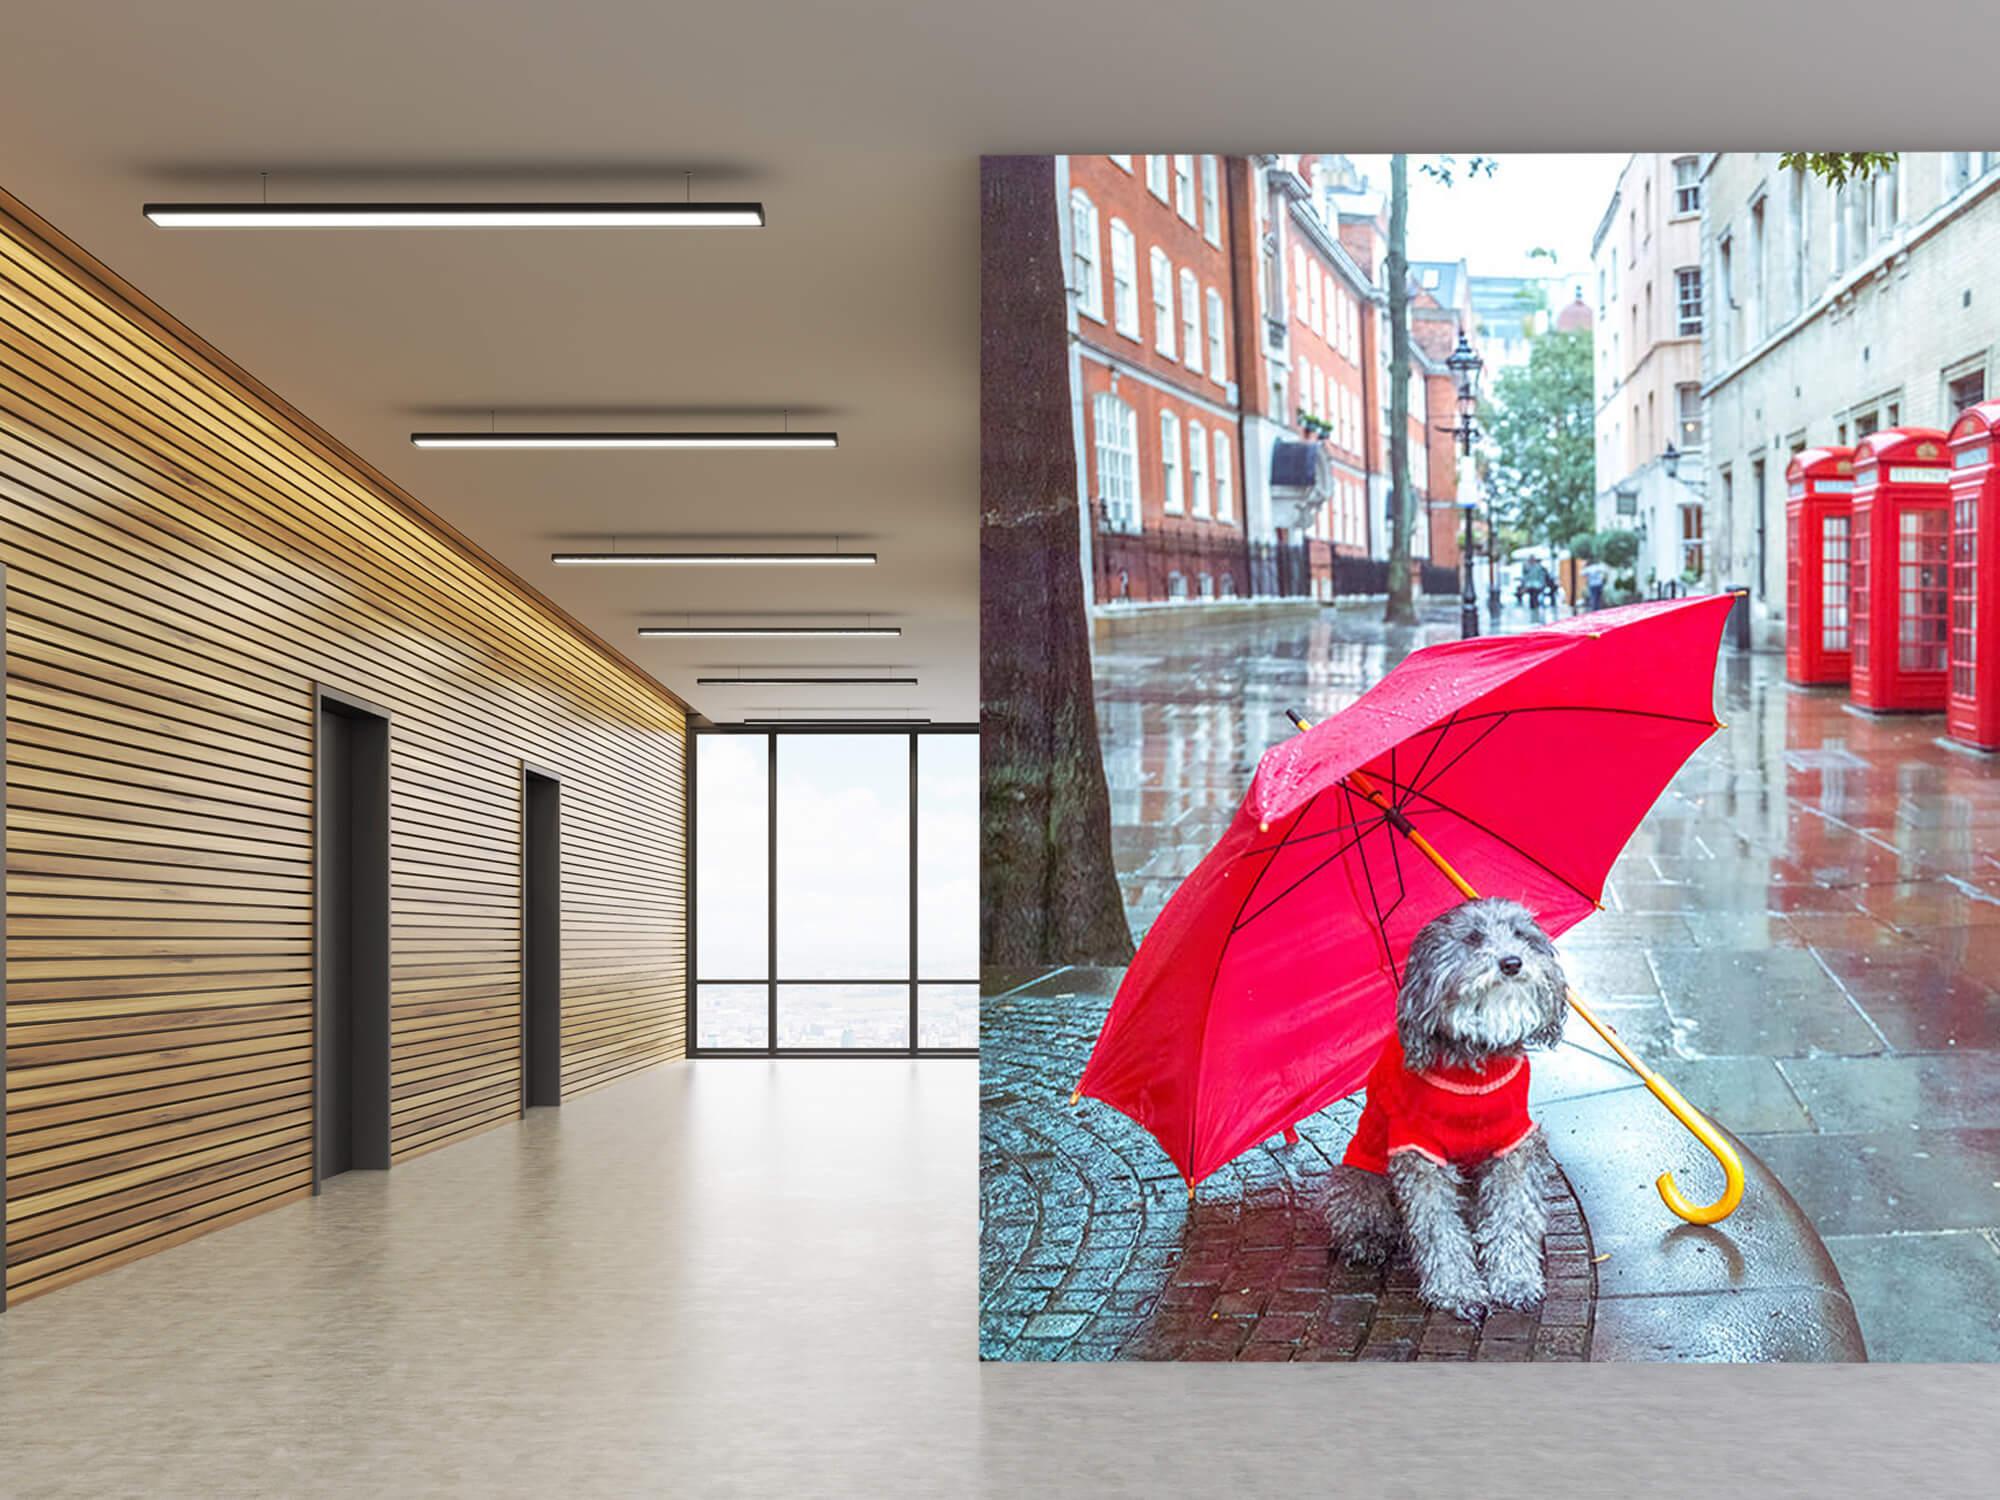 Hond met paraplu 6